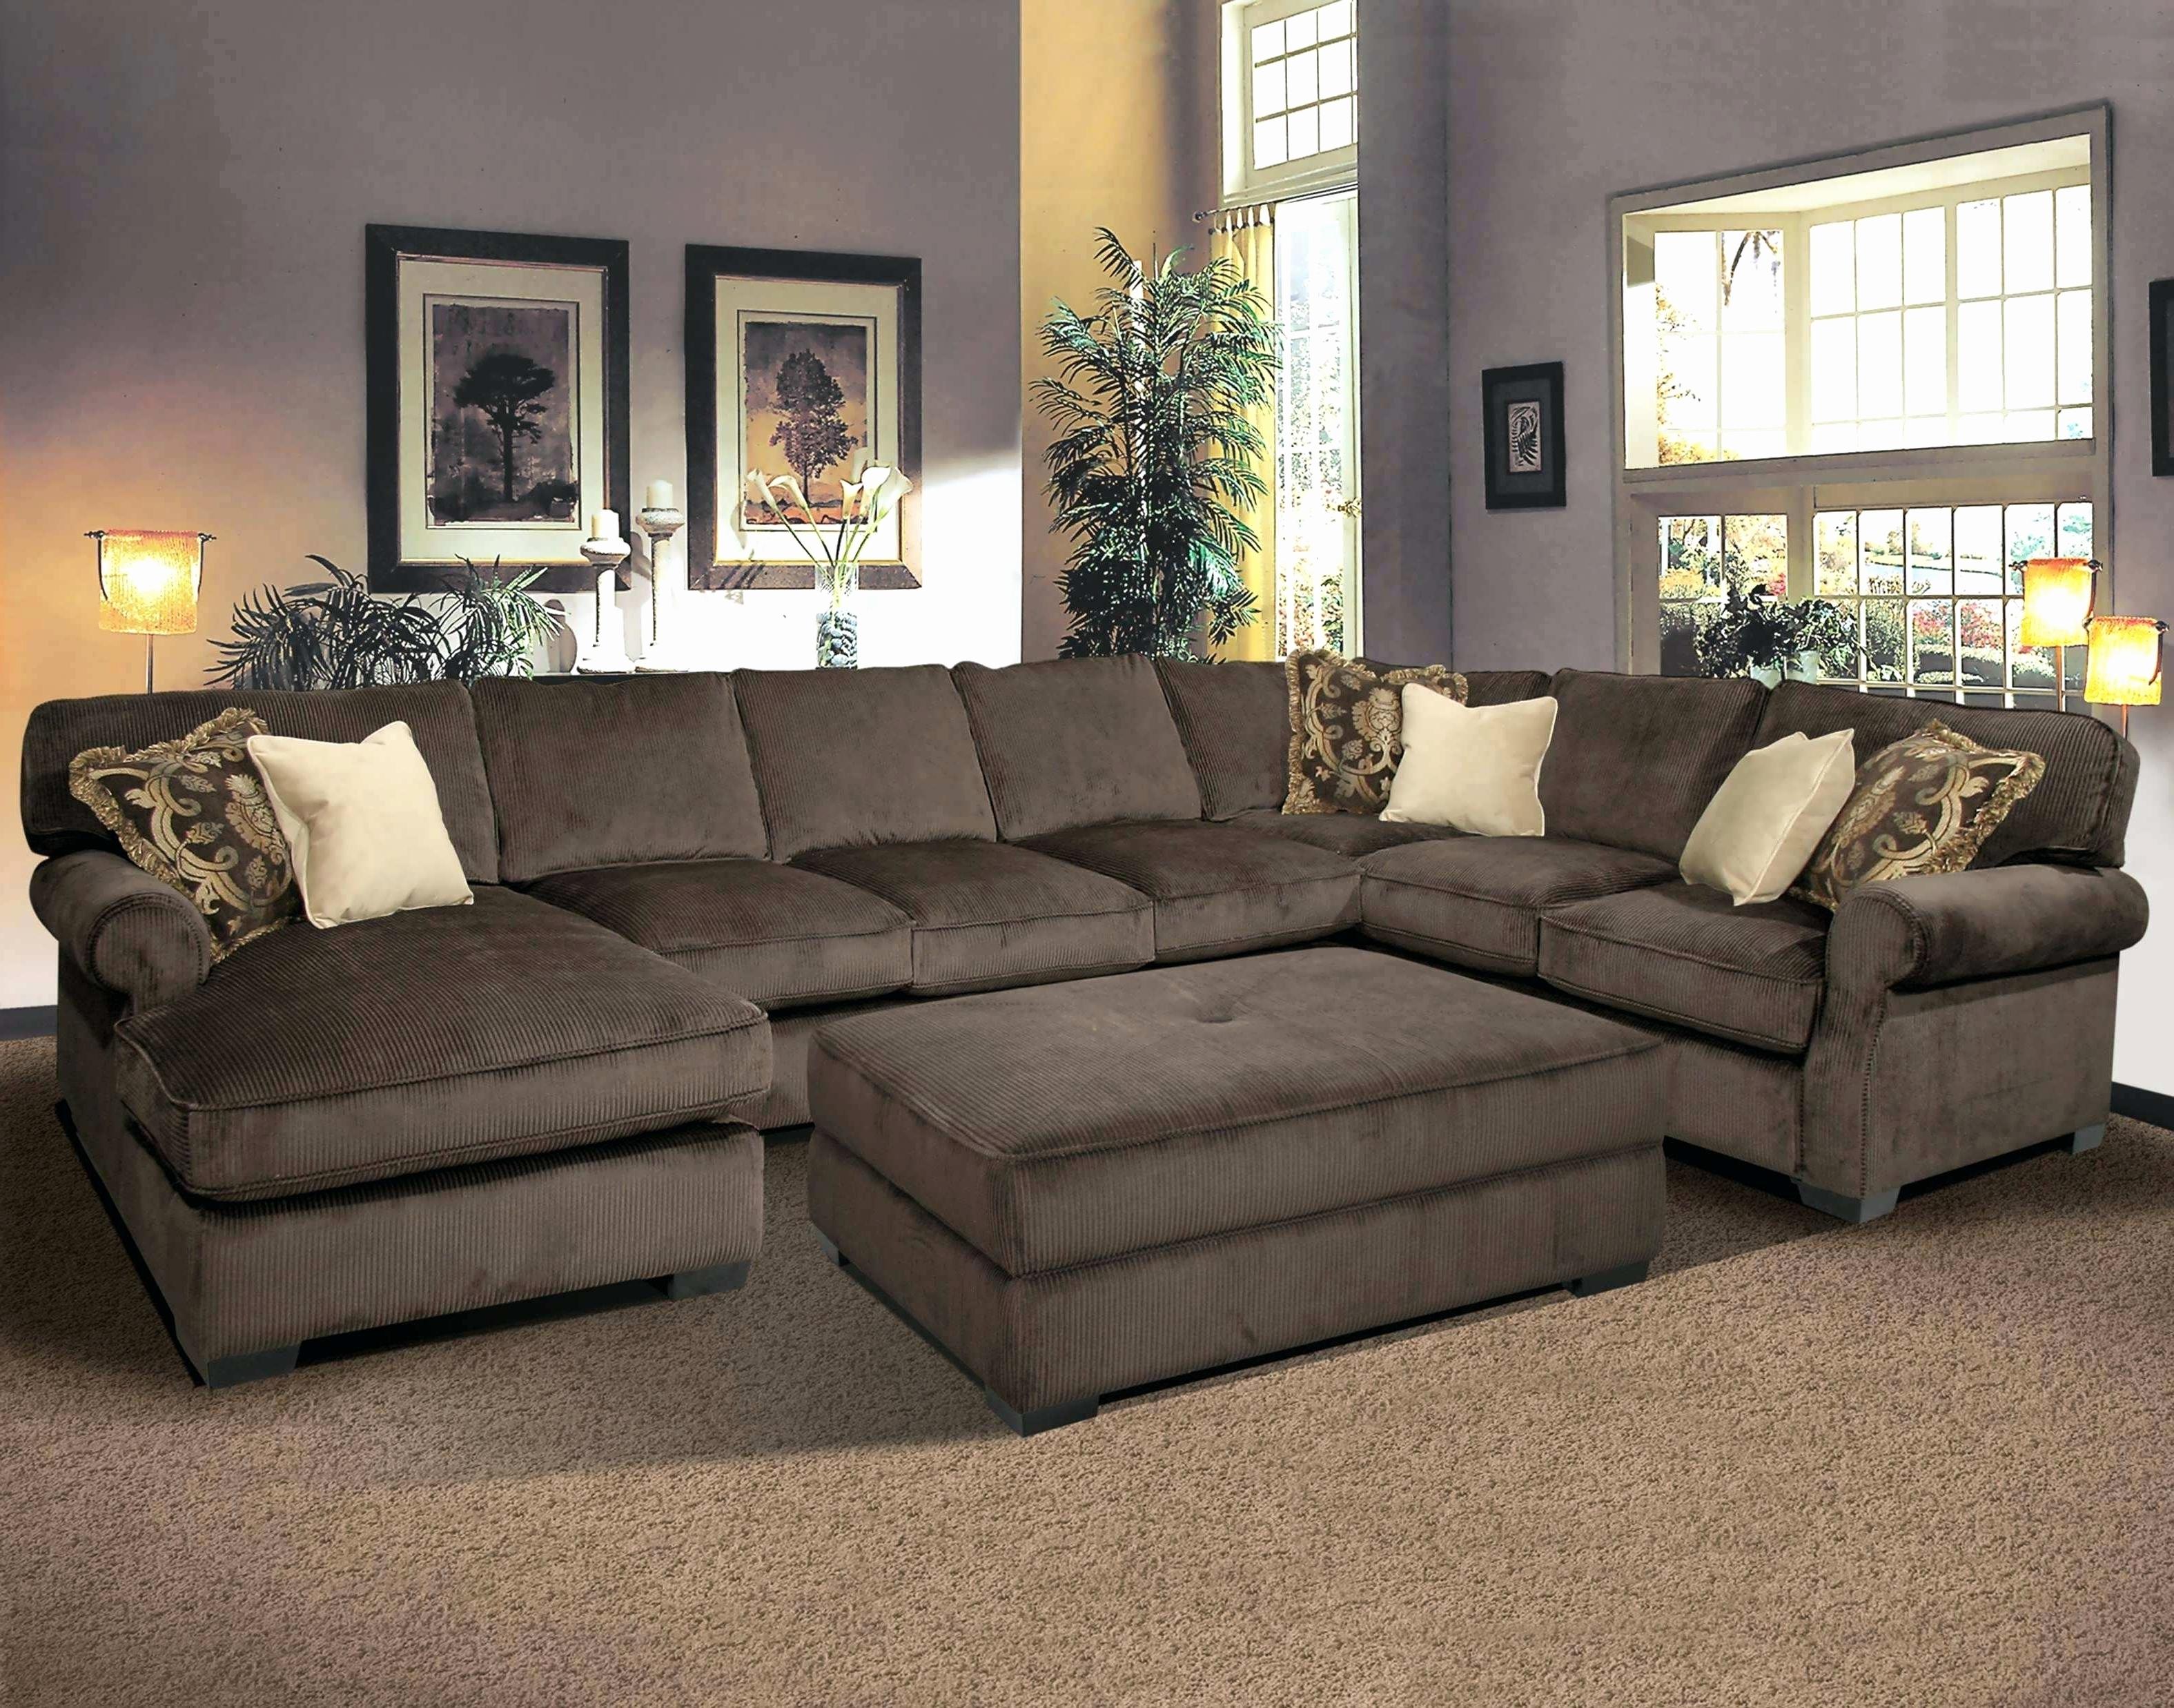 Genuine Leather Sofa Sets Kijiji Gta (Gallery 12 of 20)